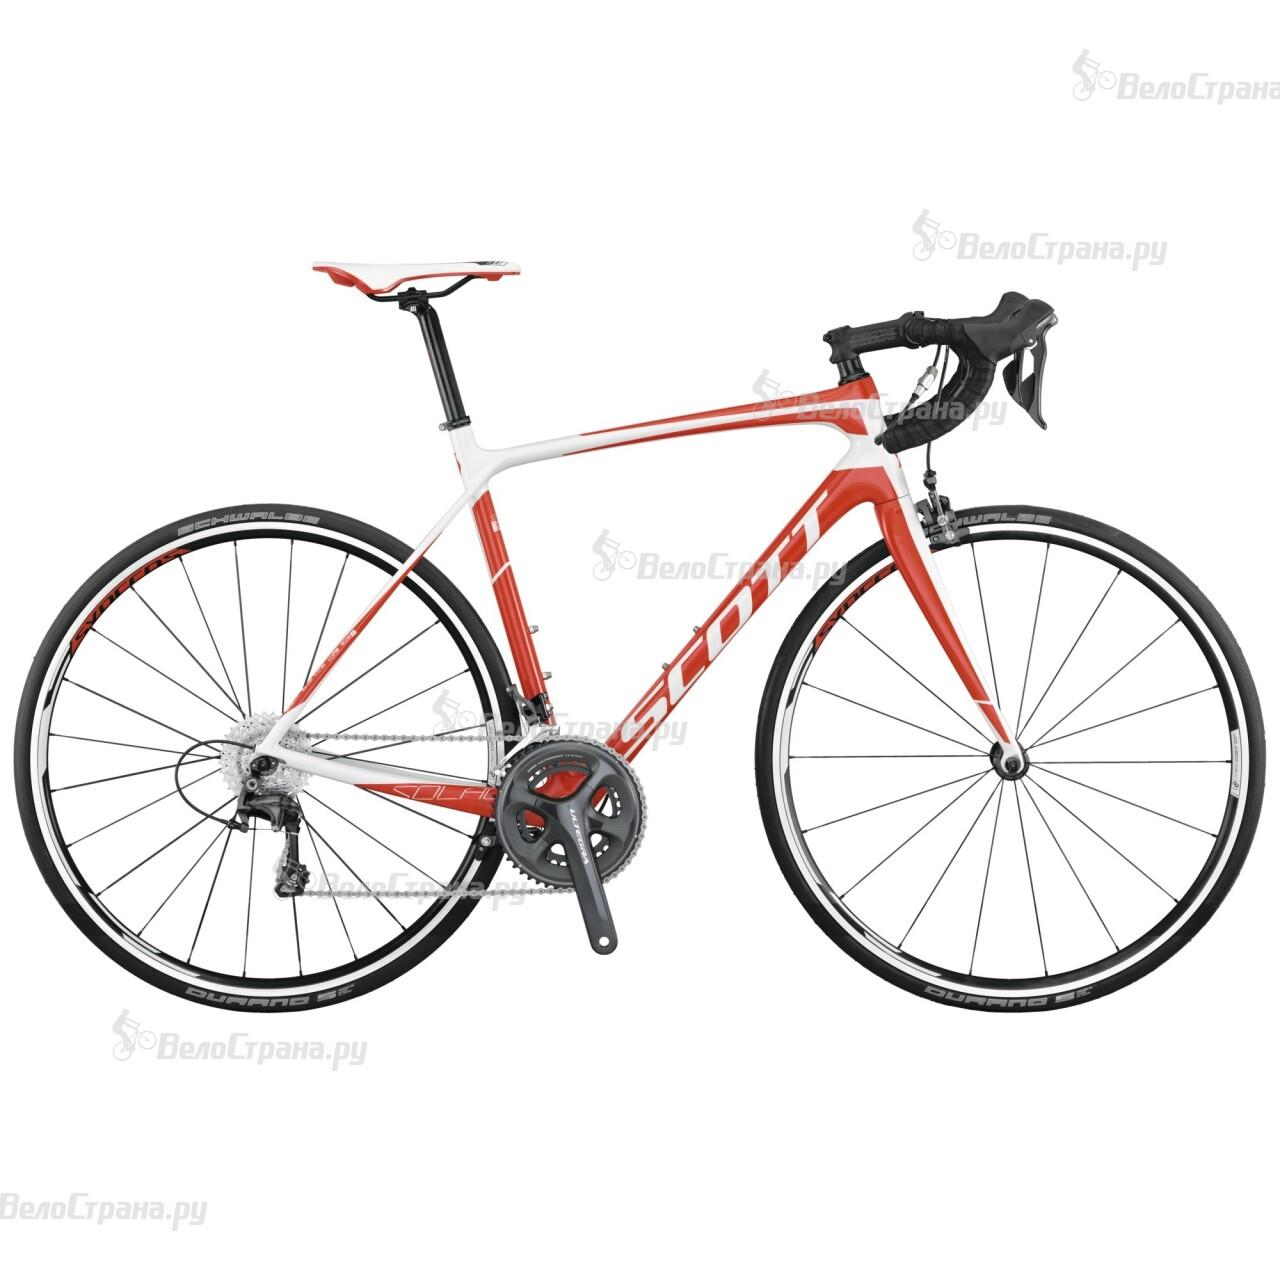 Велосипед Scott Solace 20 (2015) велосипед scott contessa solace 15 compact 2015